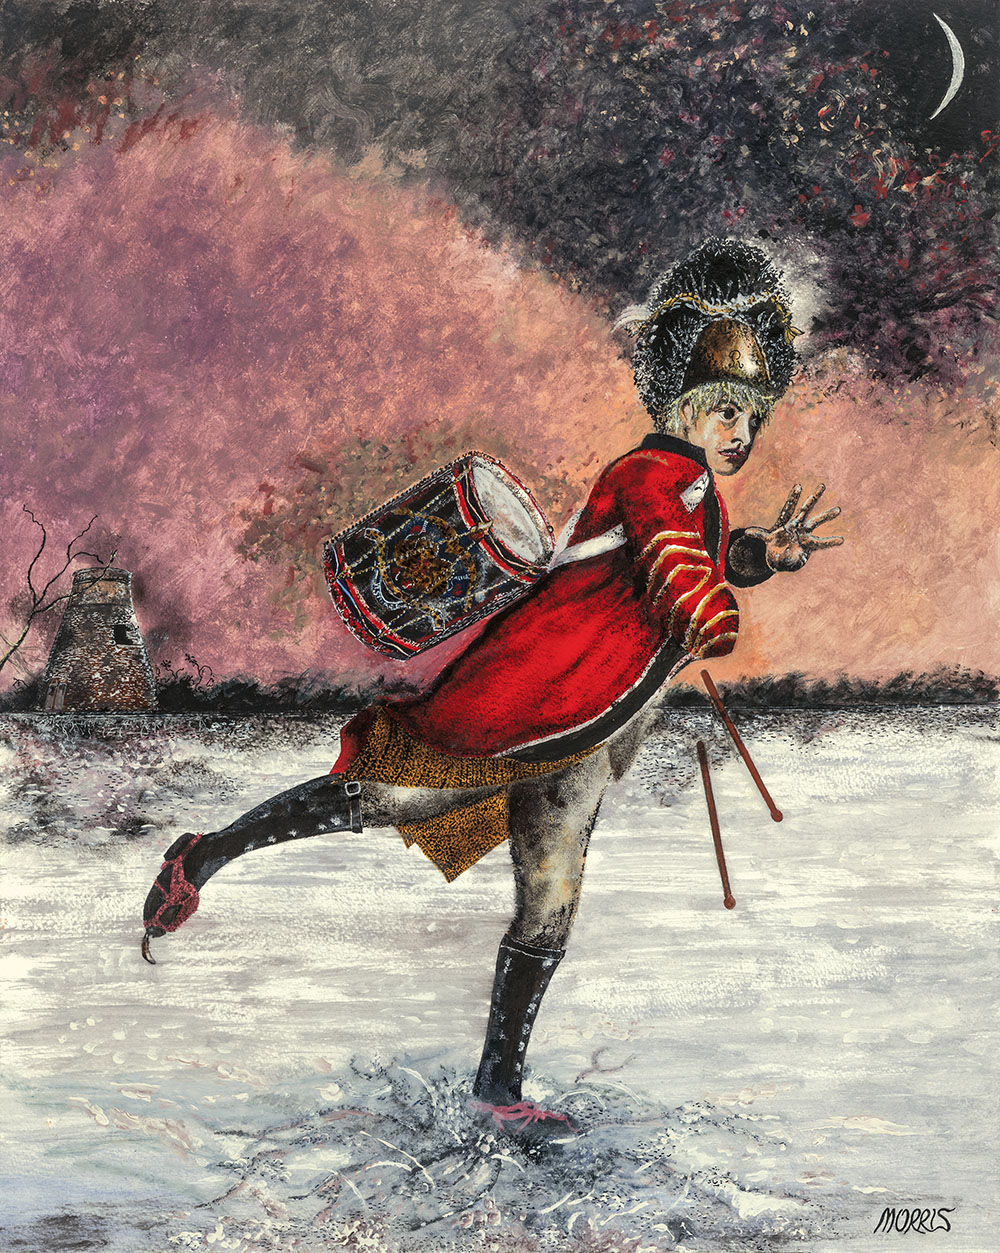 From Folklore Myth & Legend of Norfolk